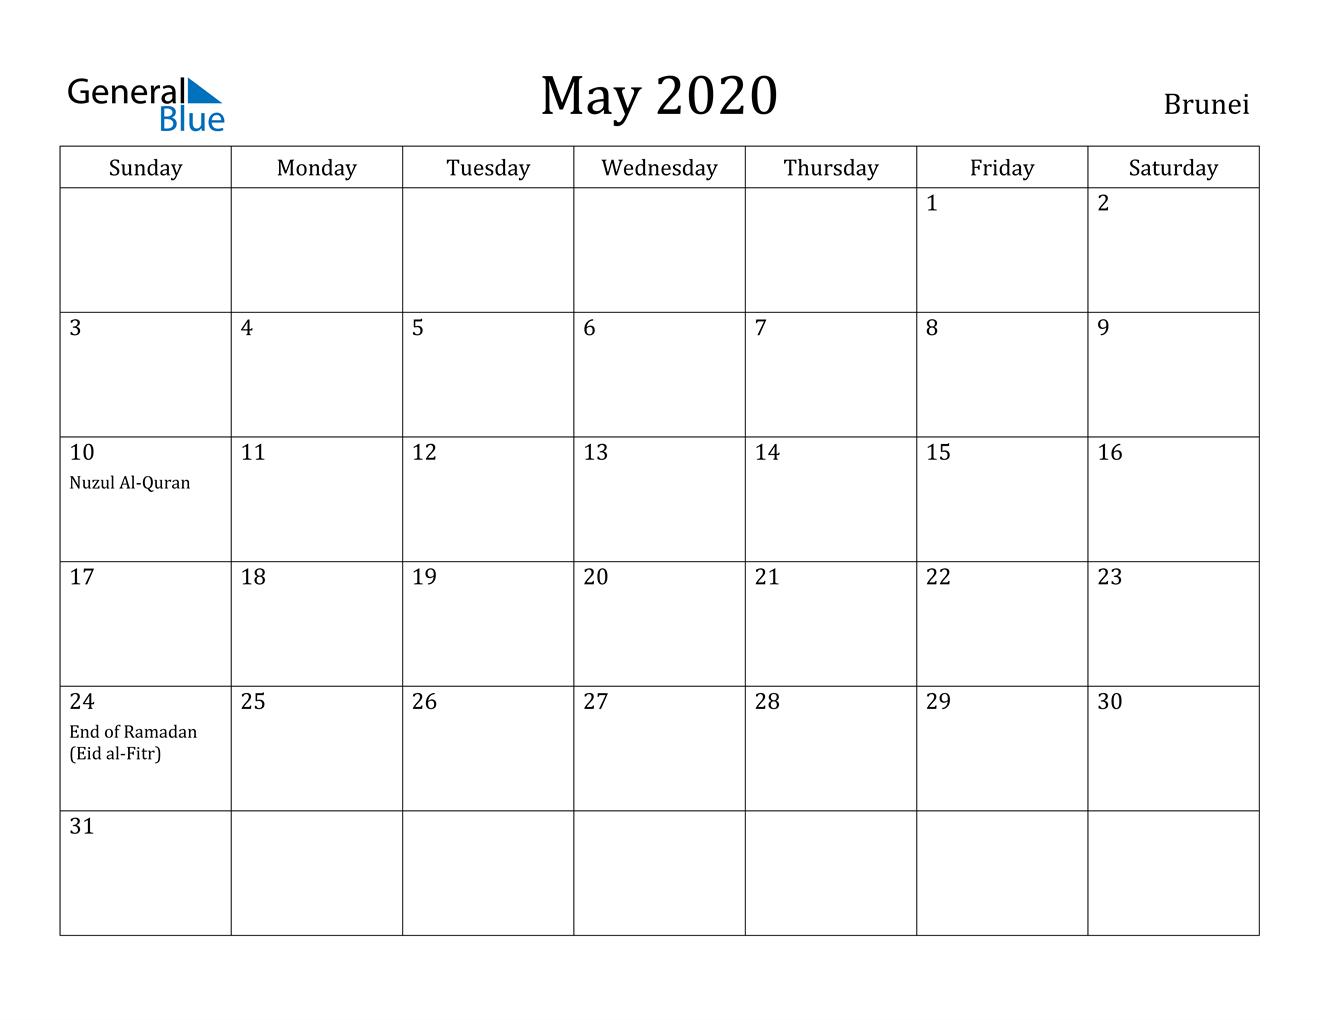 May 2020 Calendar - Brunei